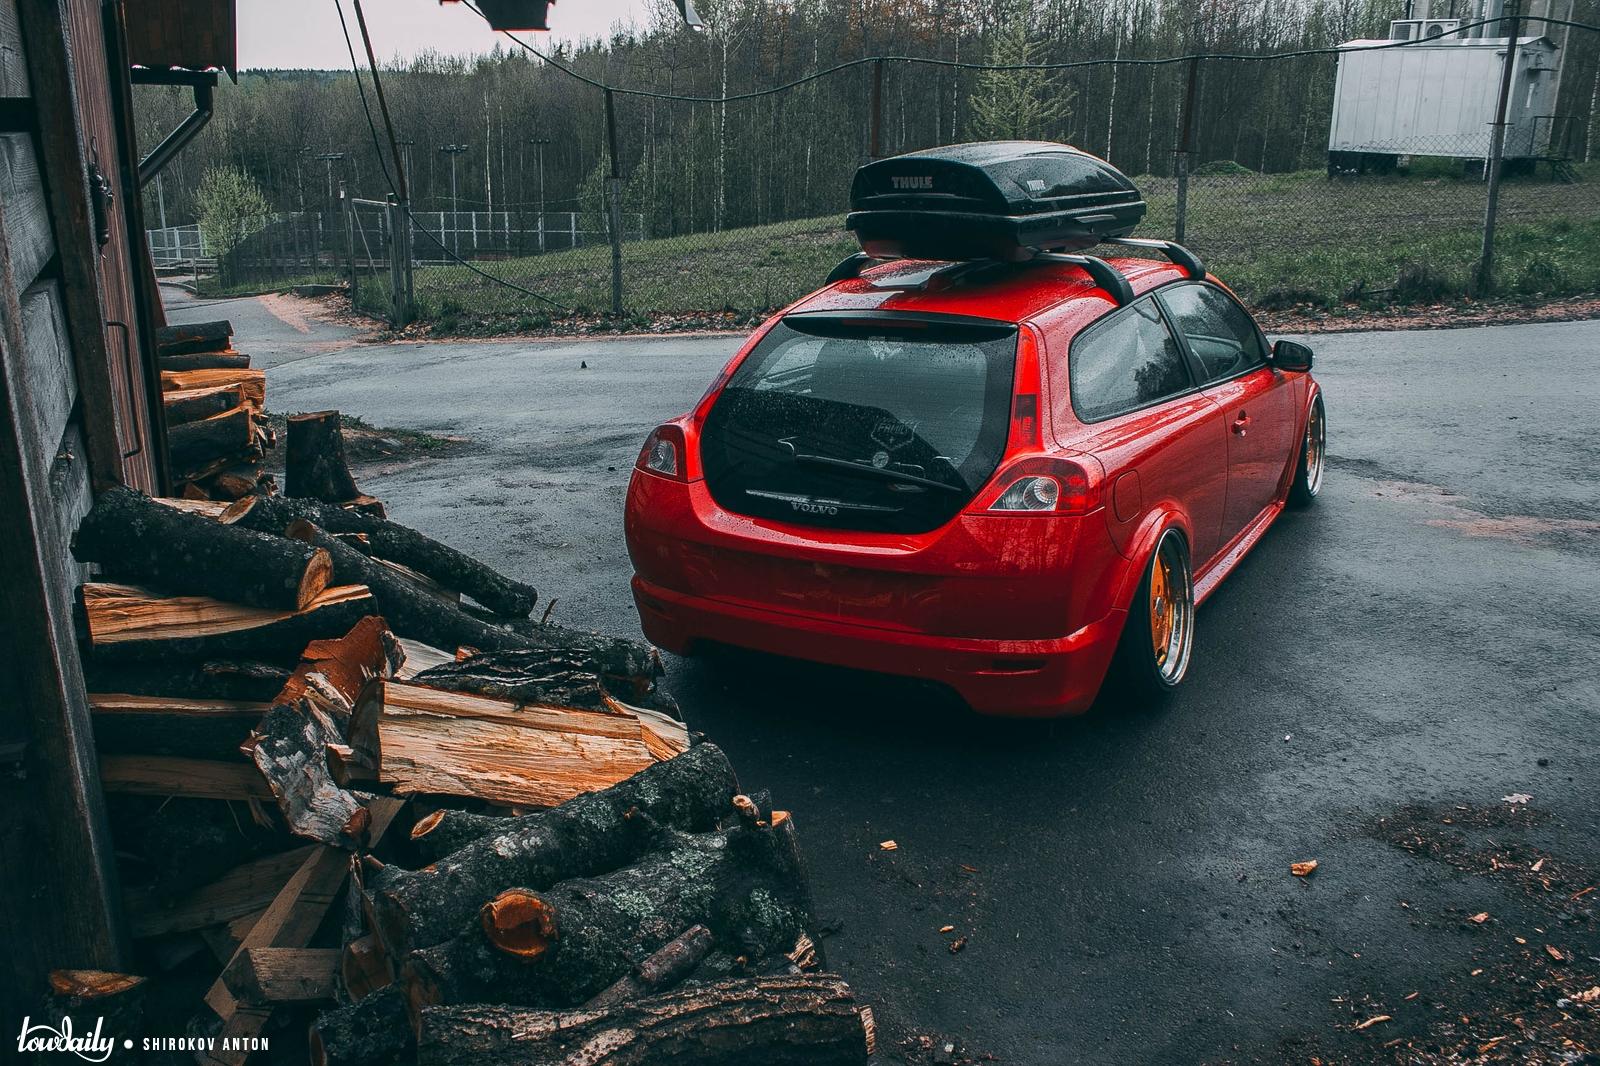 Volvo C30 Ikea _MG_7677